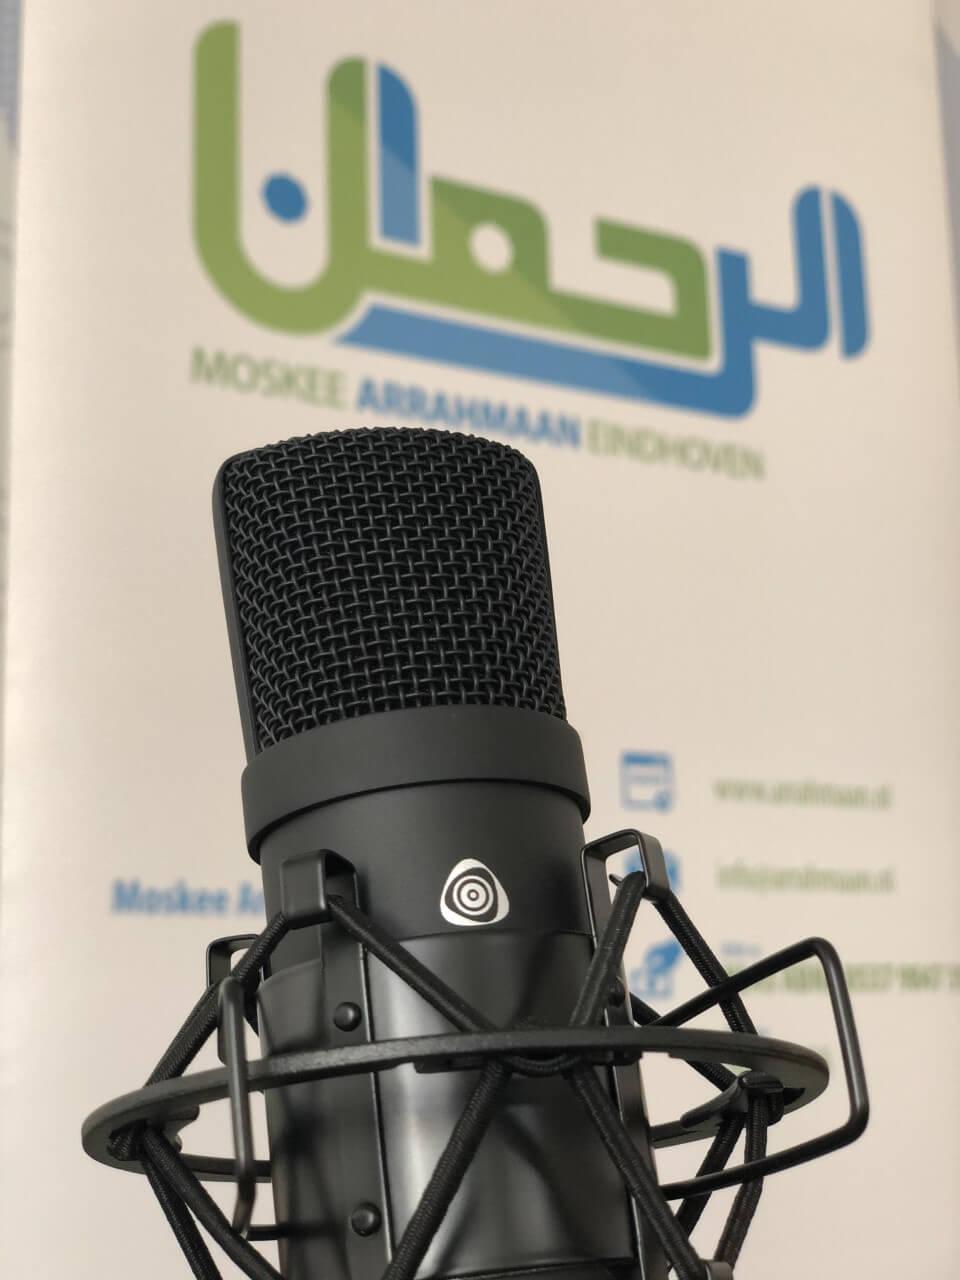 livestream moskee arrahmaan eindhoven ramadan 2020